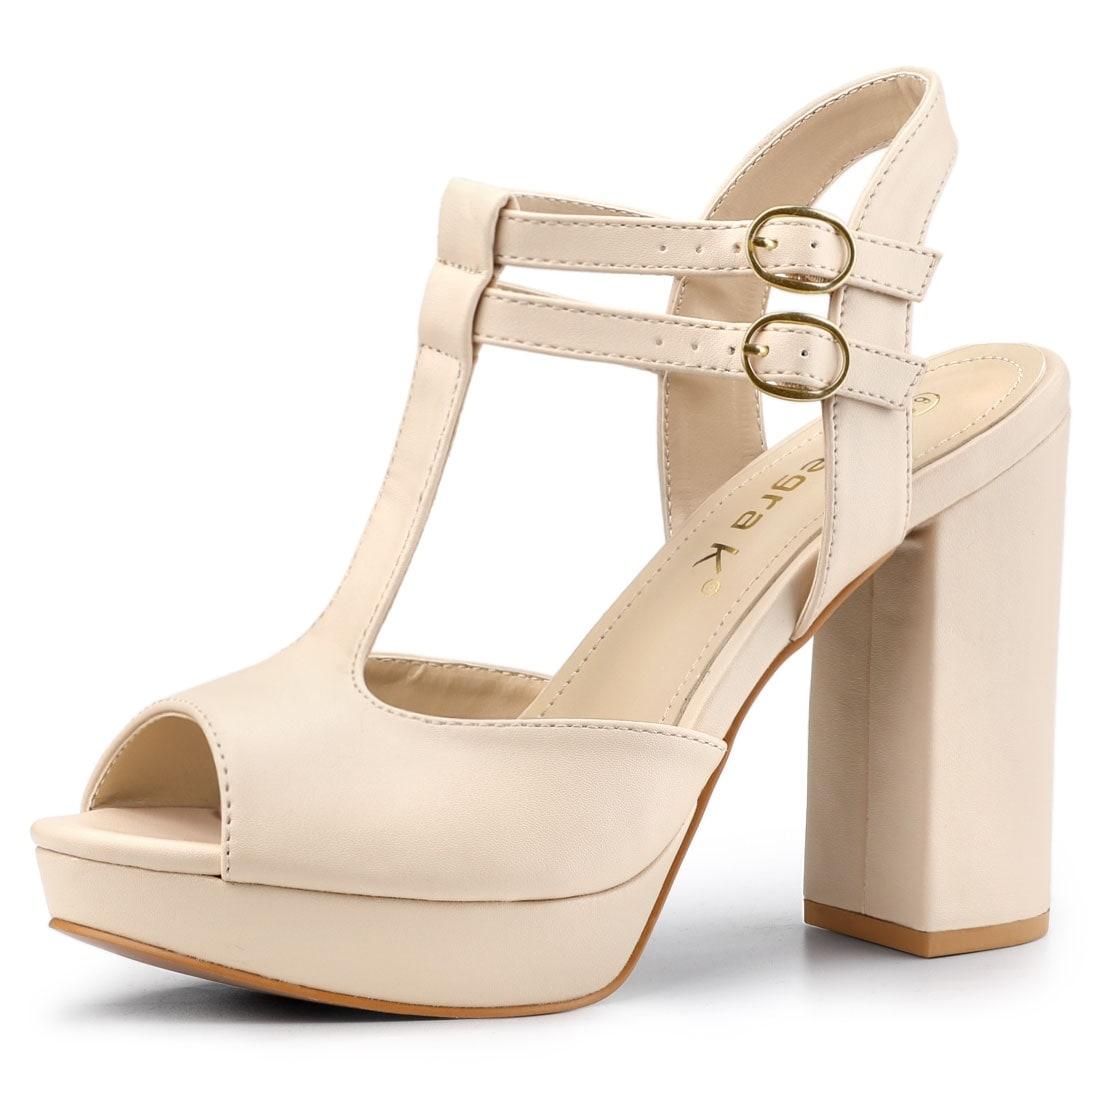 women's open toe heel shoes